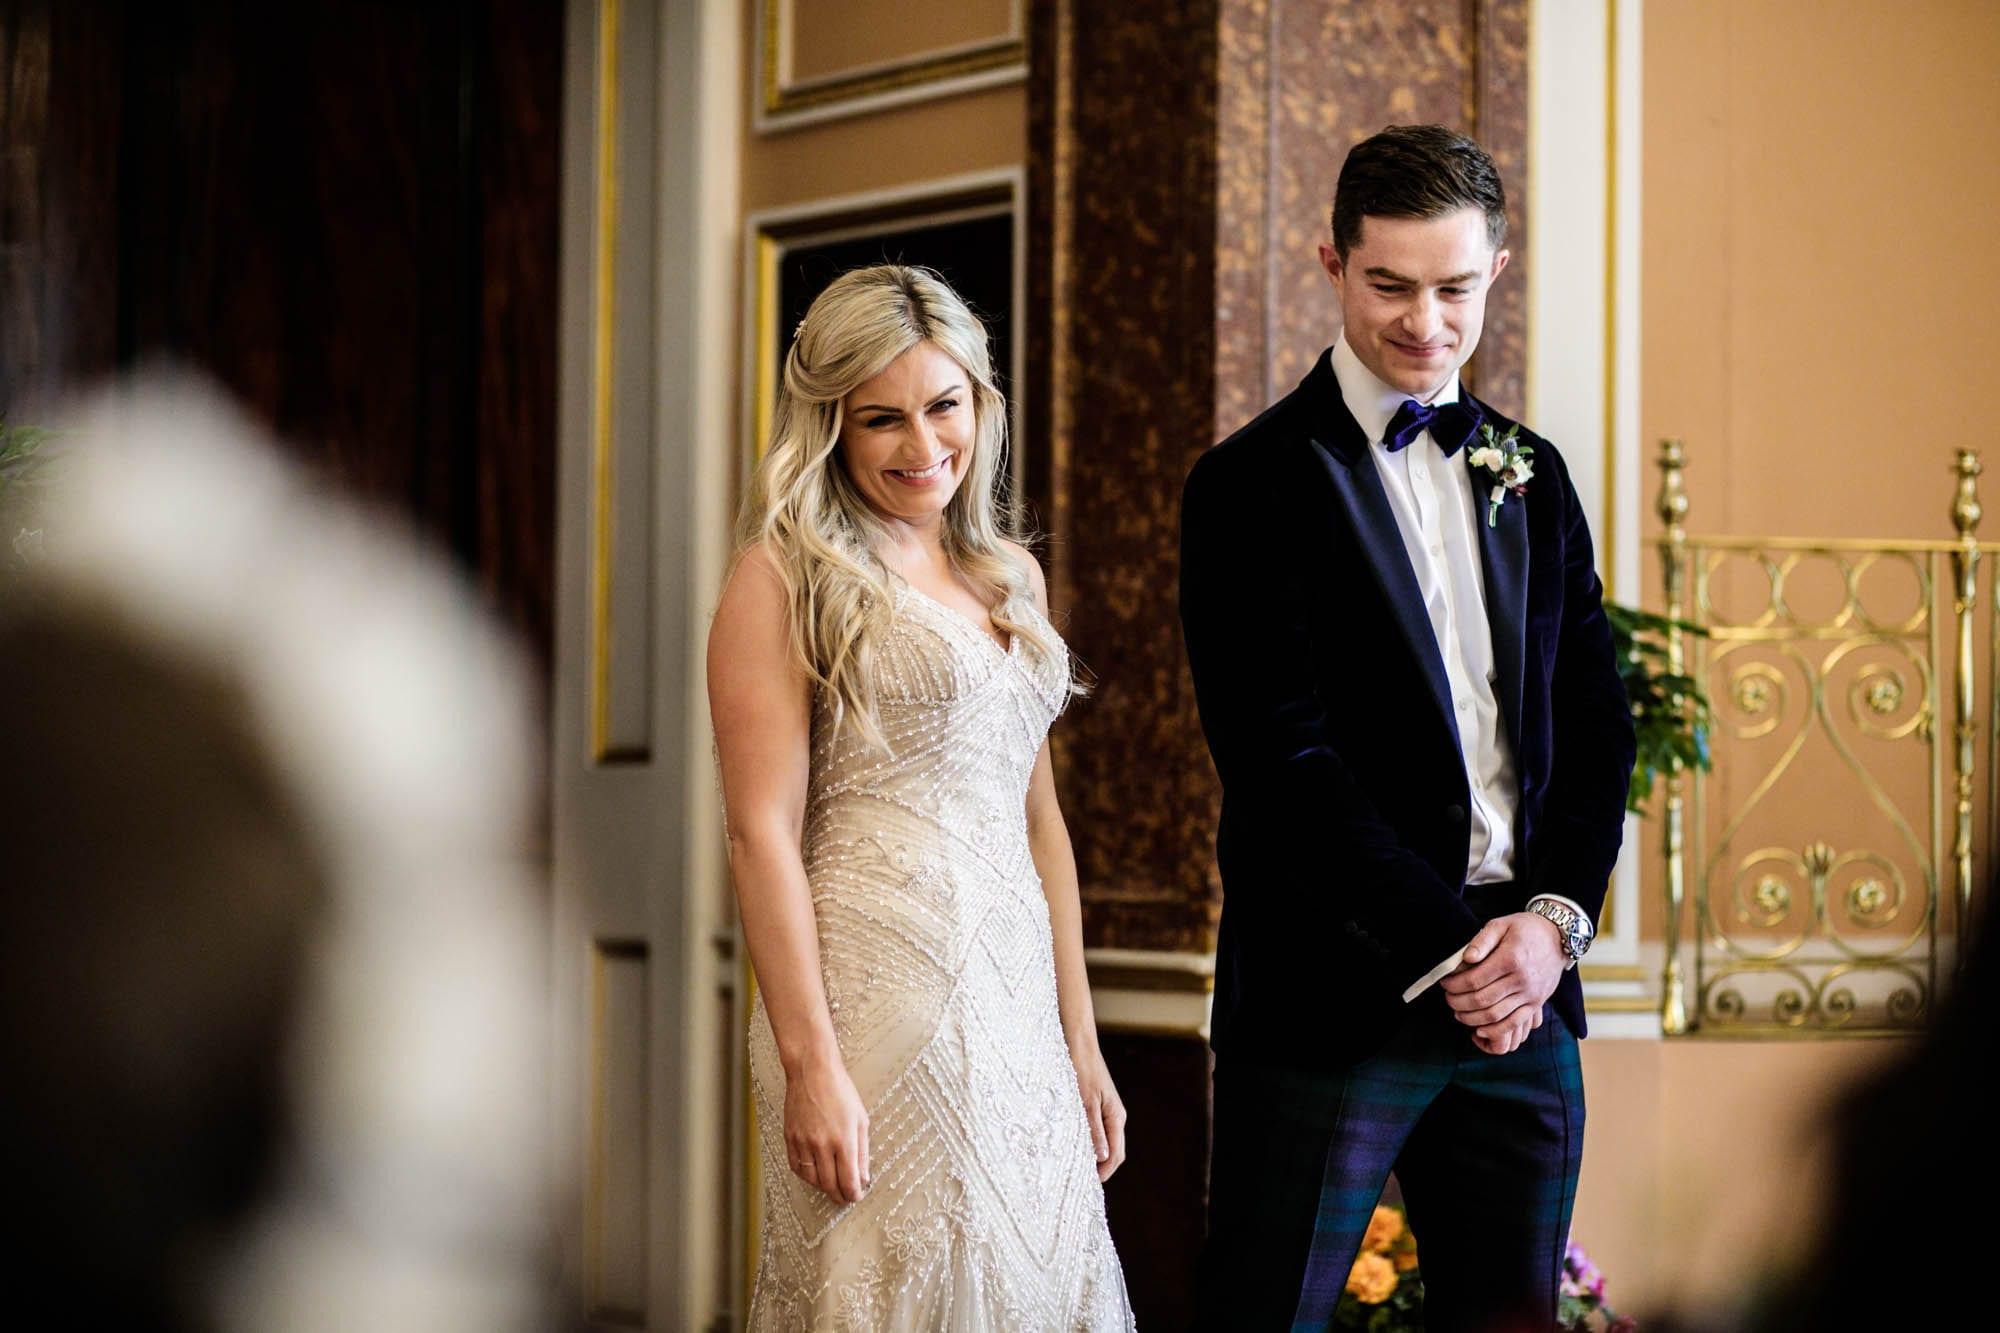 Liverpool Town Hall Wedding Photographs